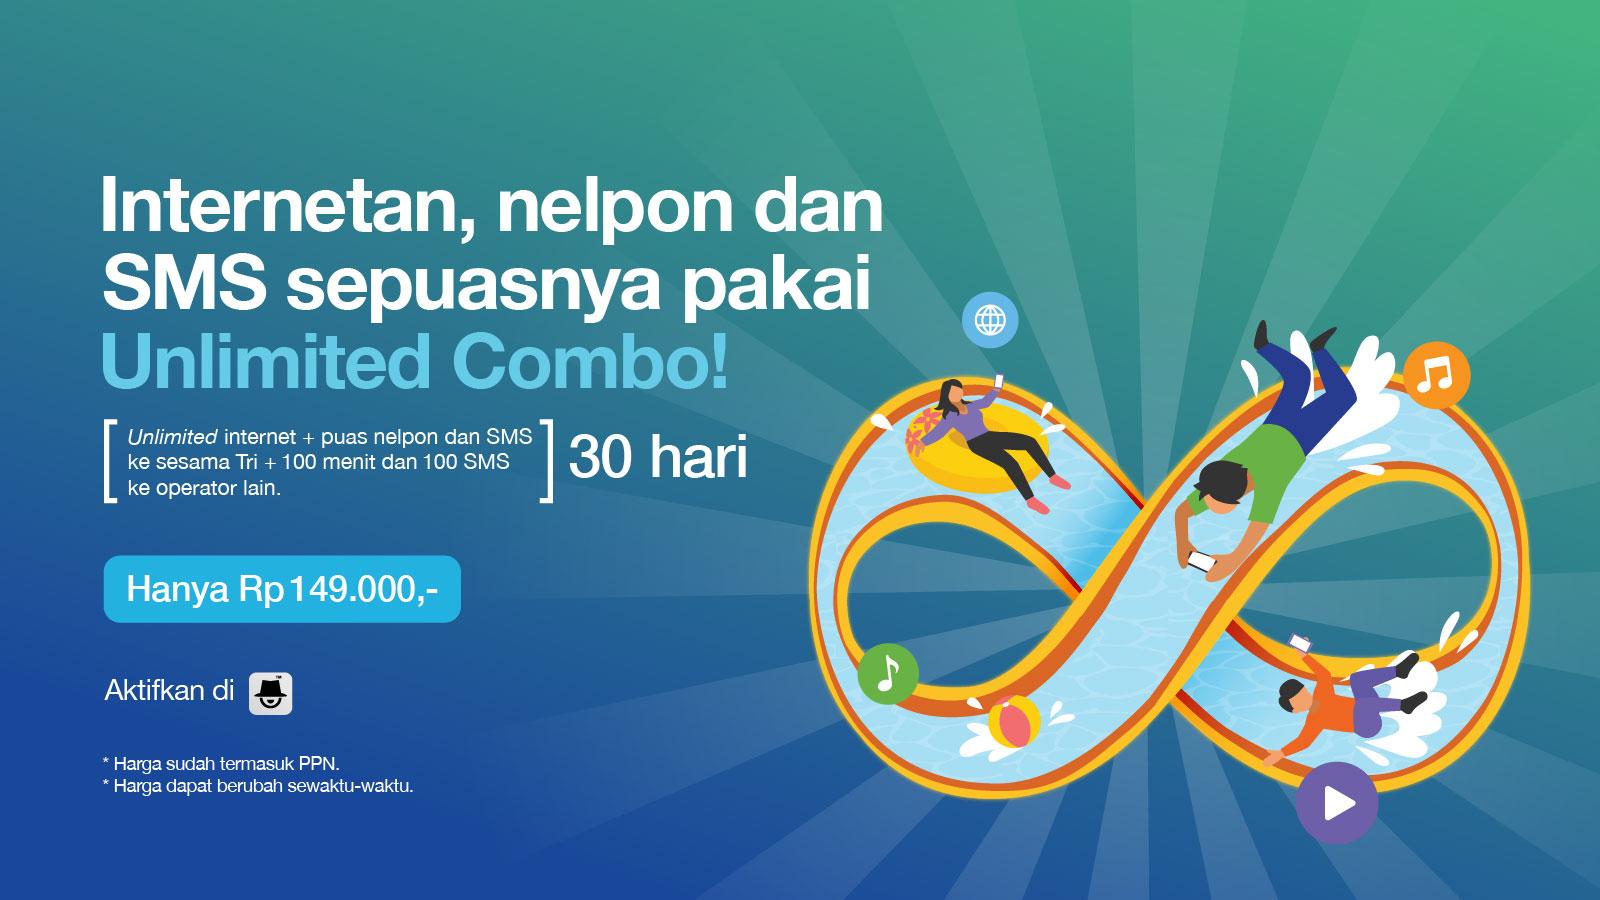 Unlimited Combo Tri Indonesia